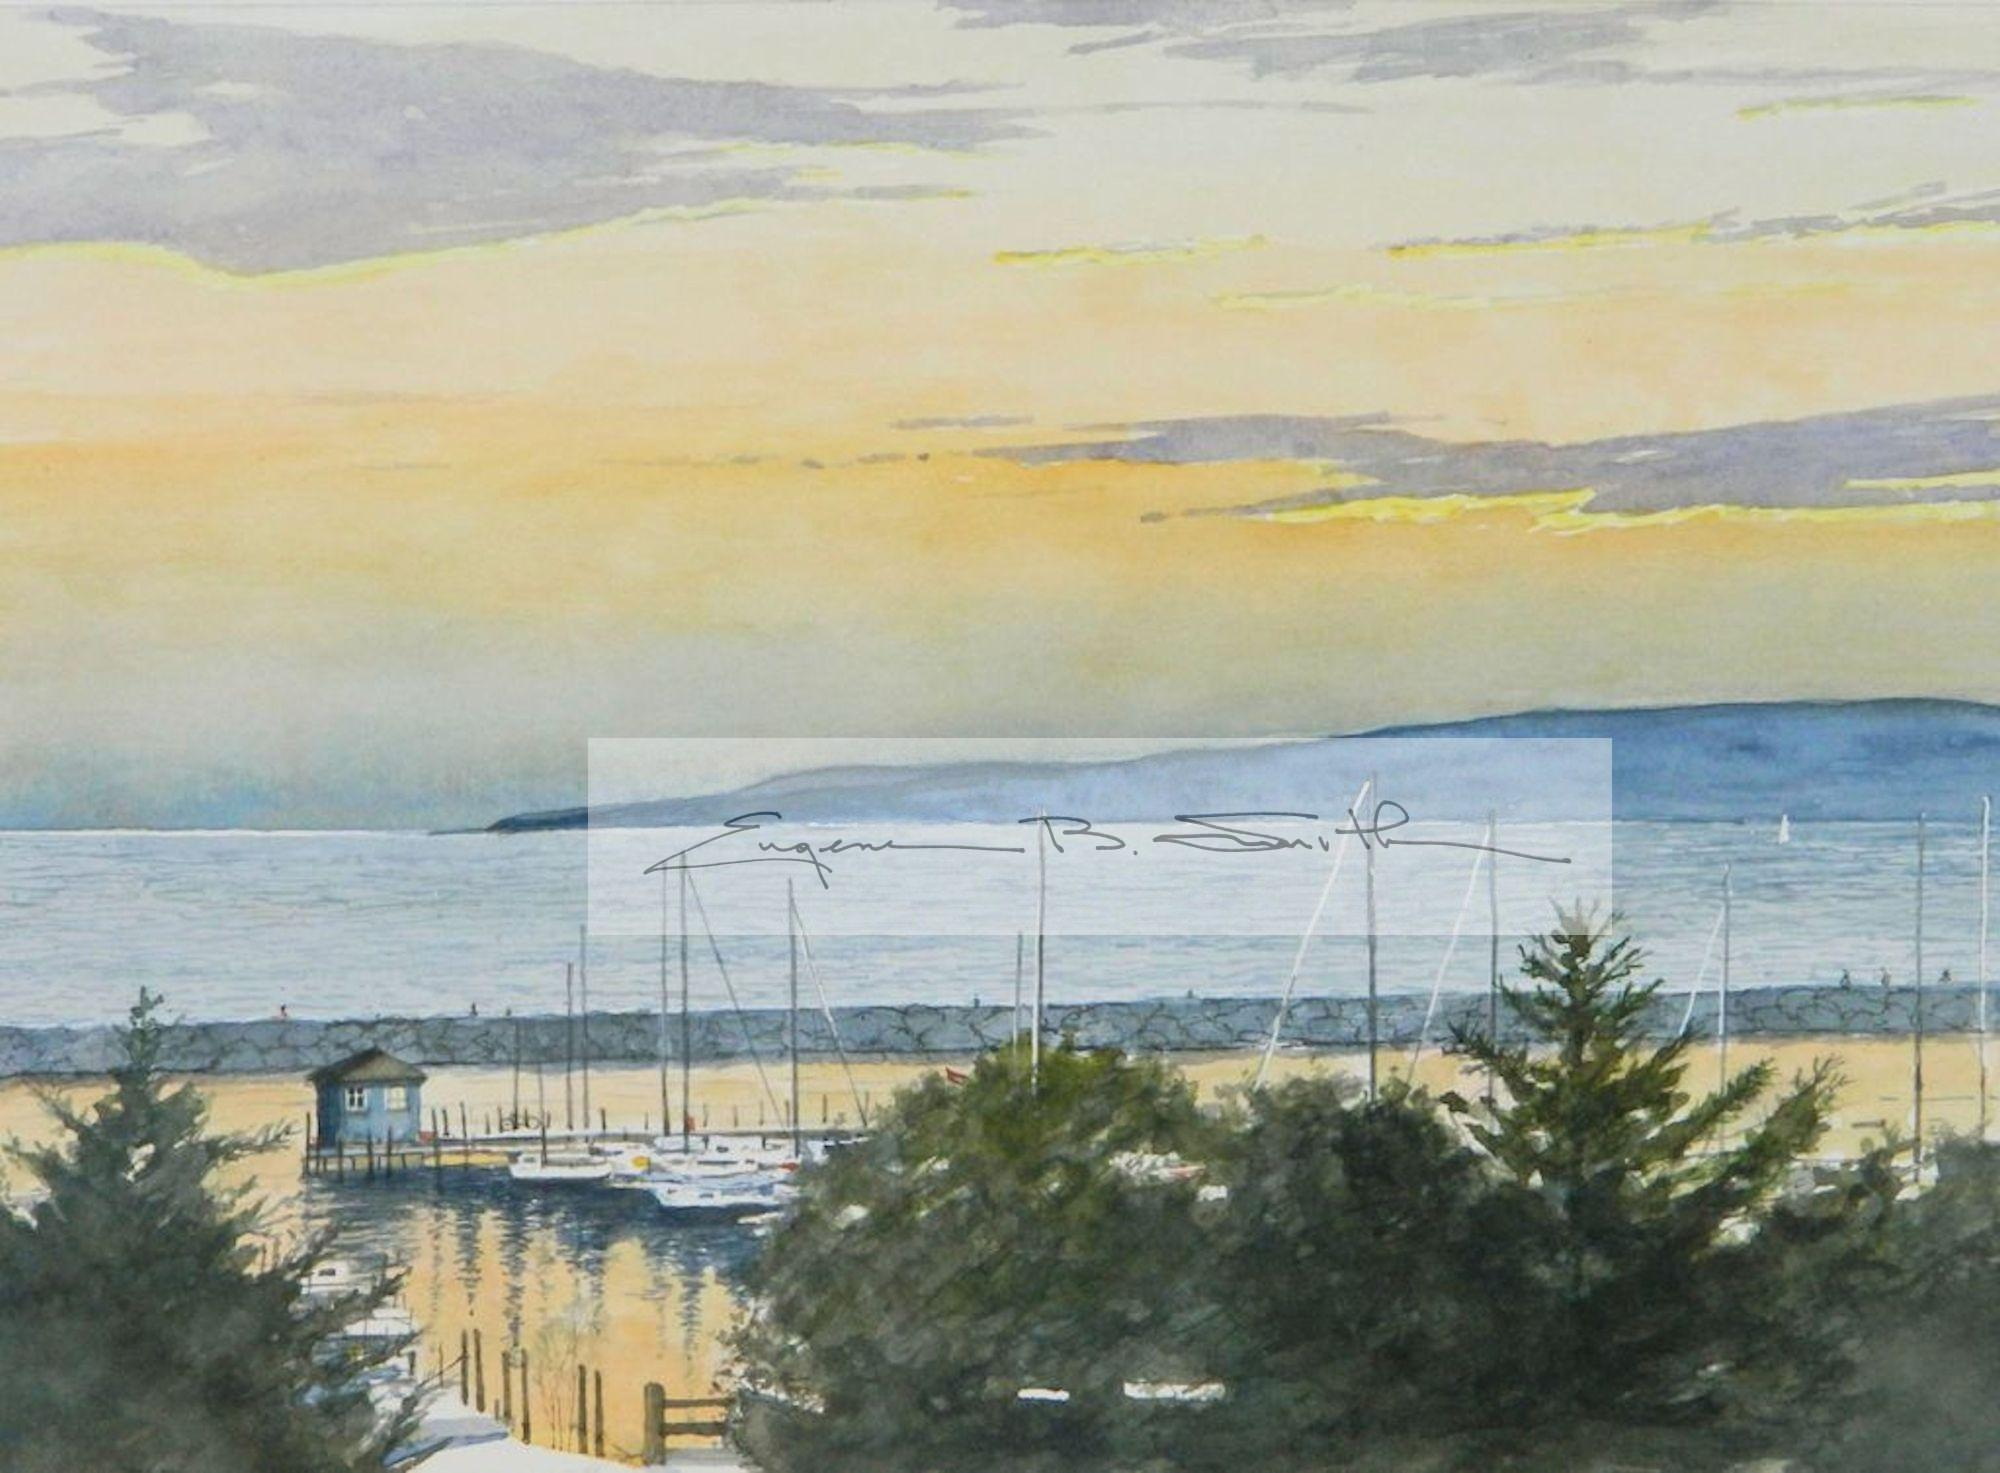 Giclee Print | Image Size: 10.5 x 15 | $135 | Frame Size: 20 x 24